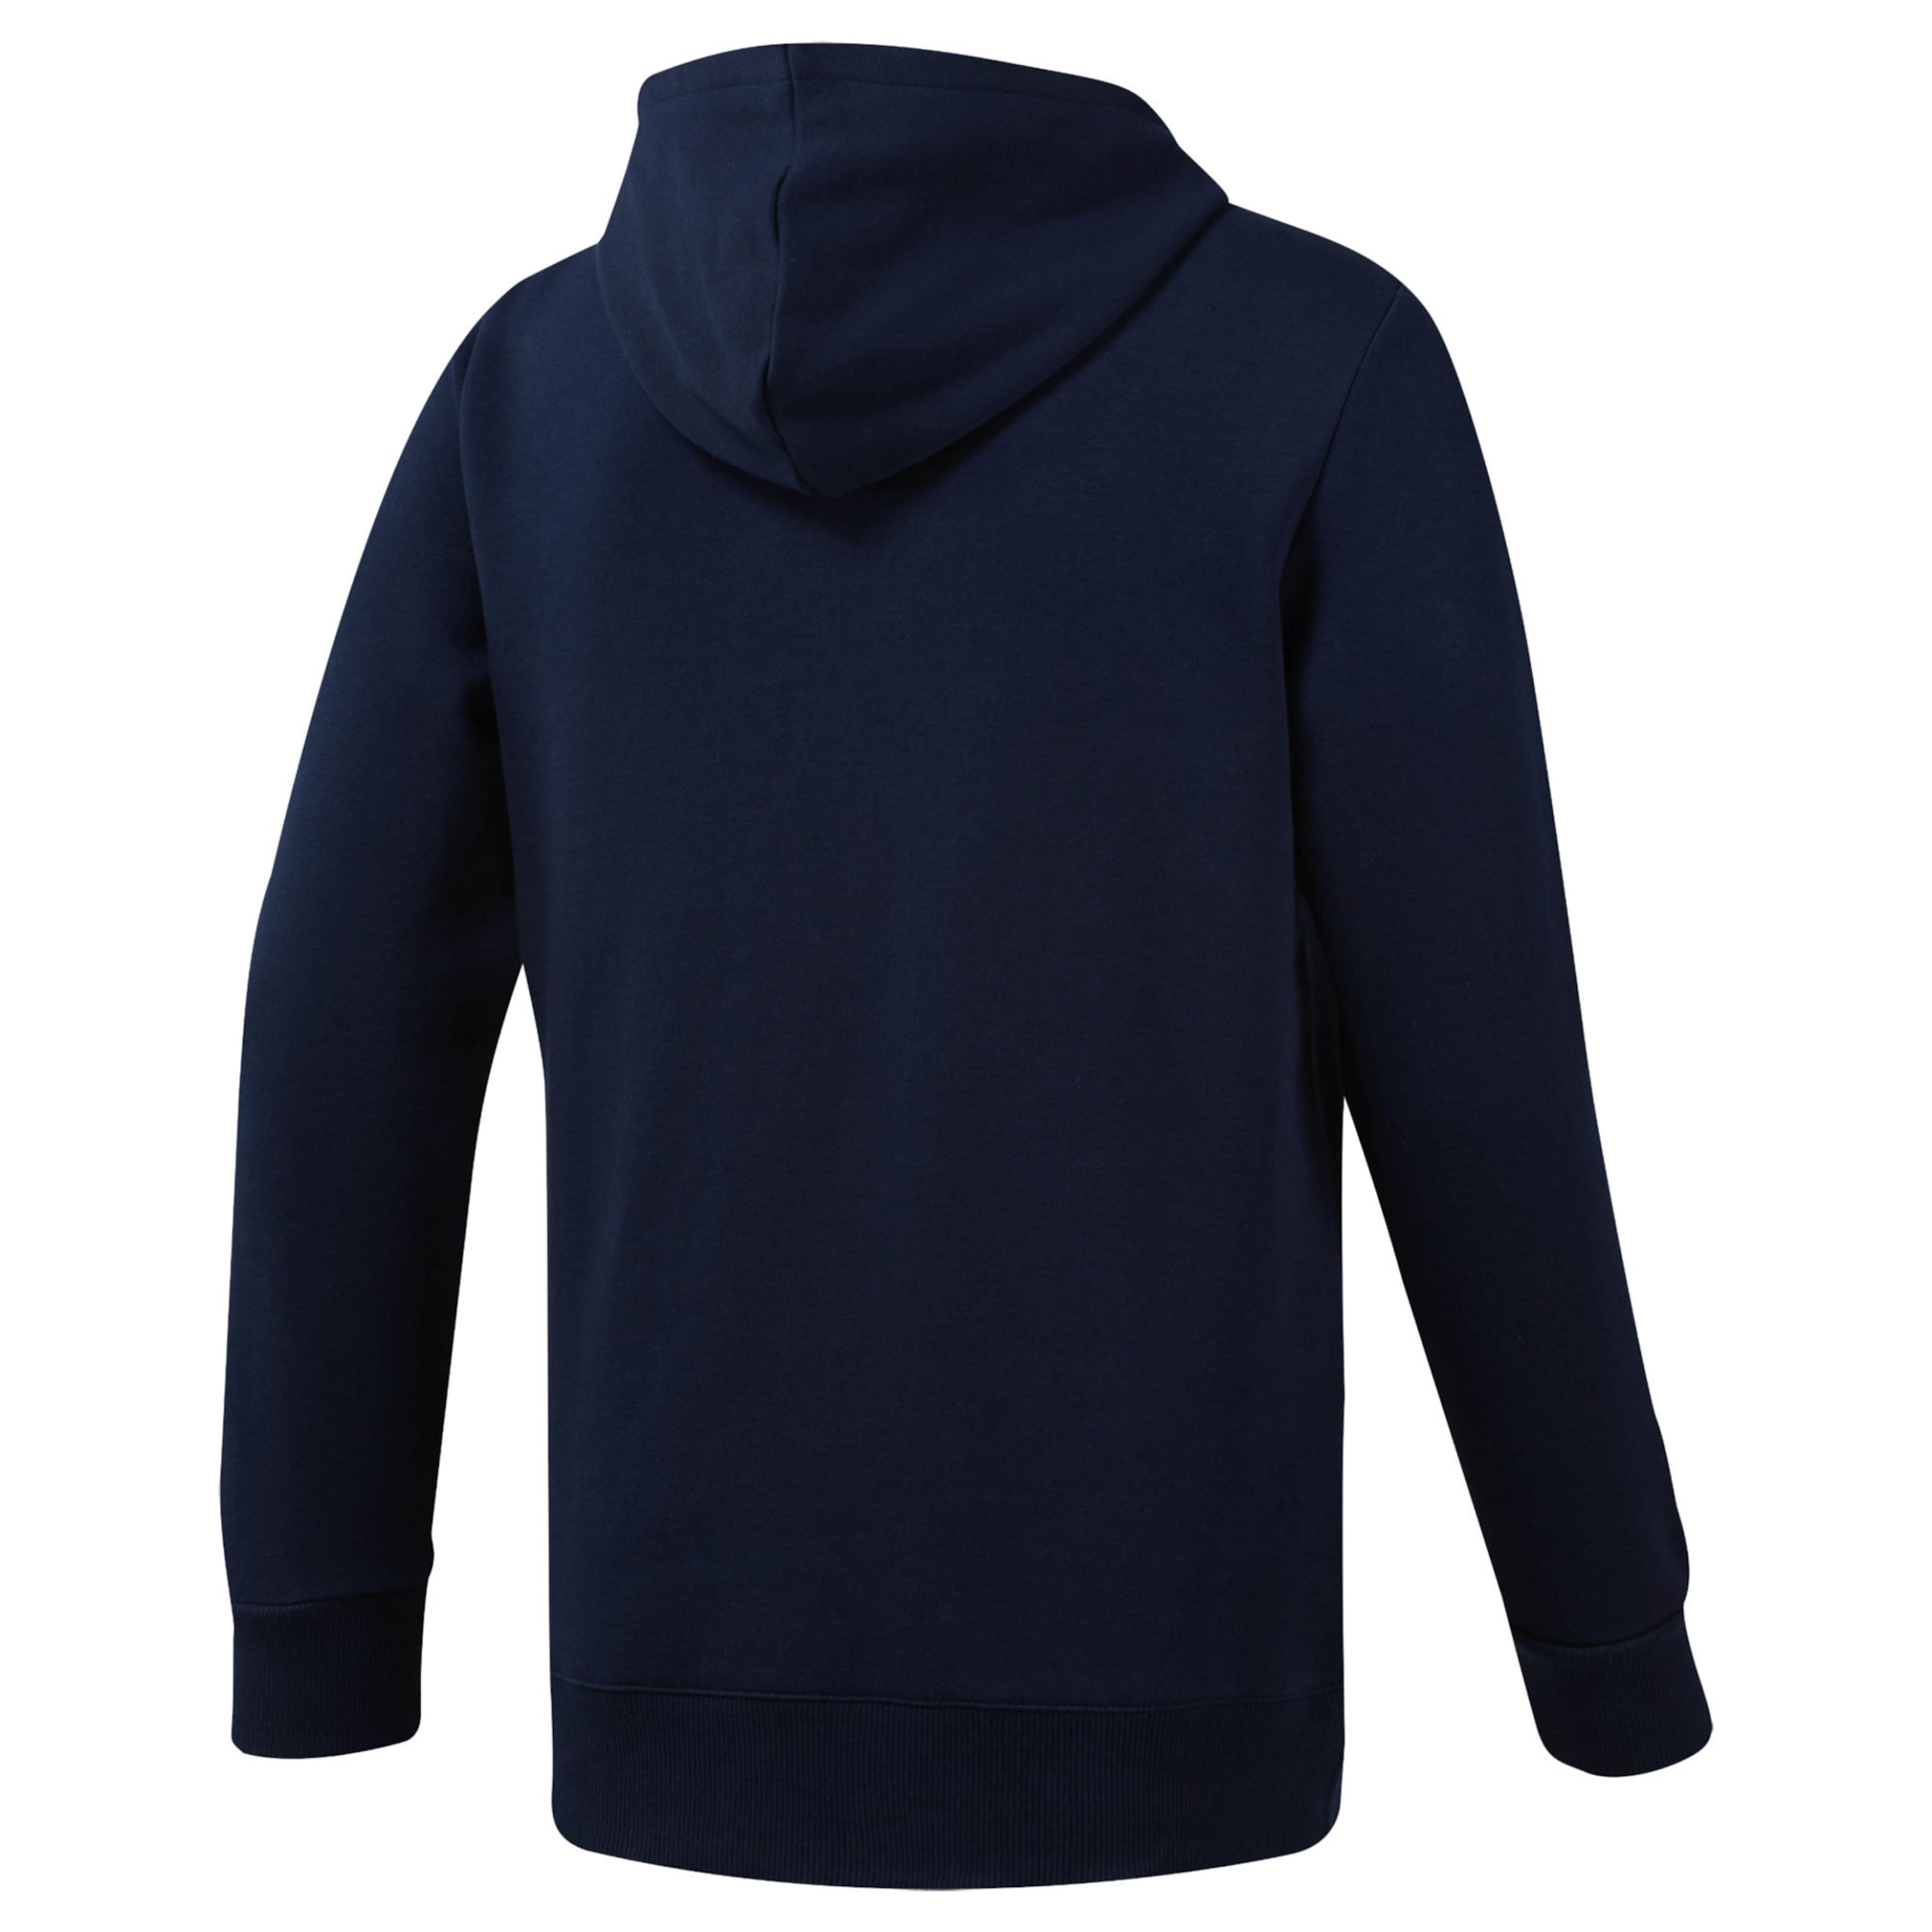 Classic BlauWeiß Sweater Reebok Reebok In hQtrds